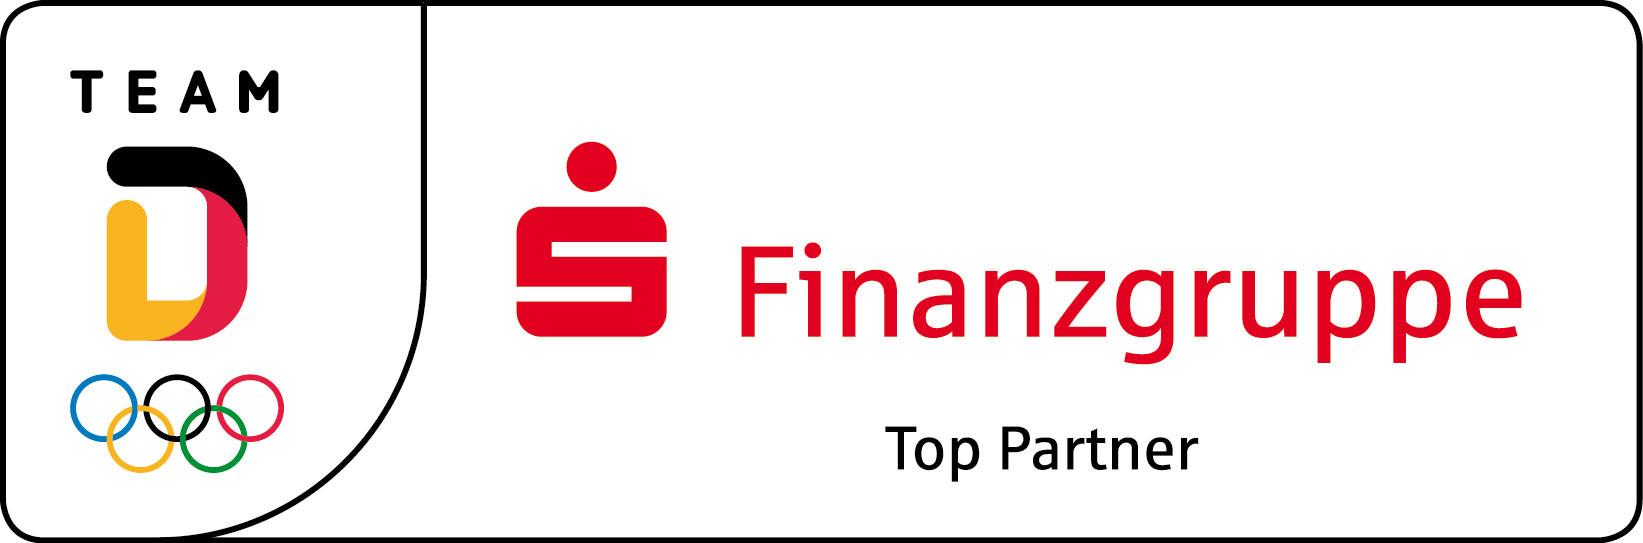 Team D S Finanzgruppe 4c q Outline RGB 300dpi